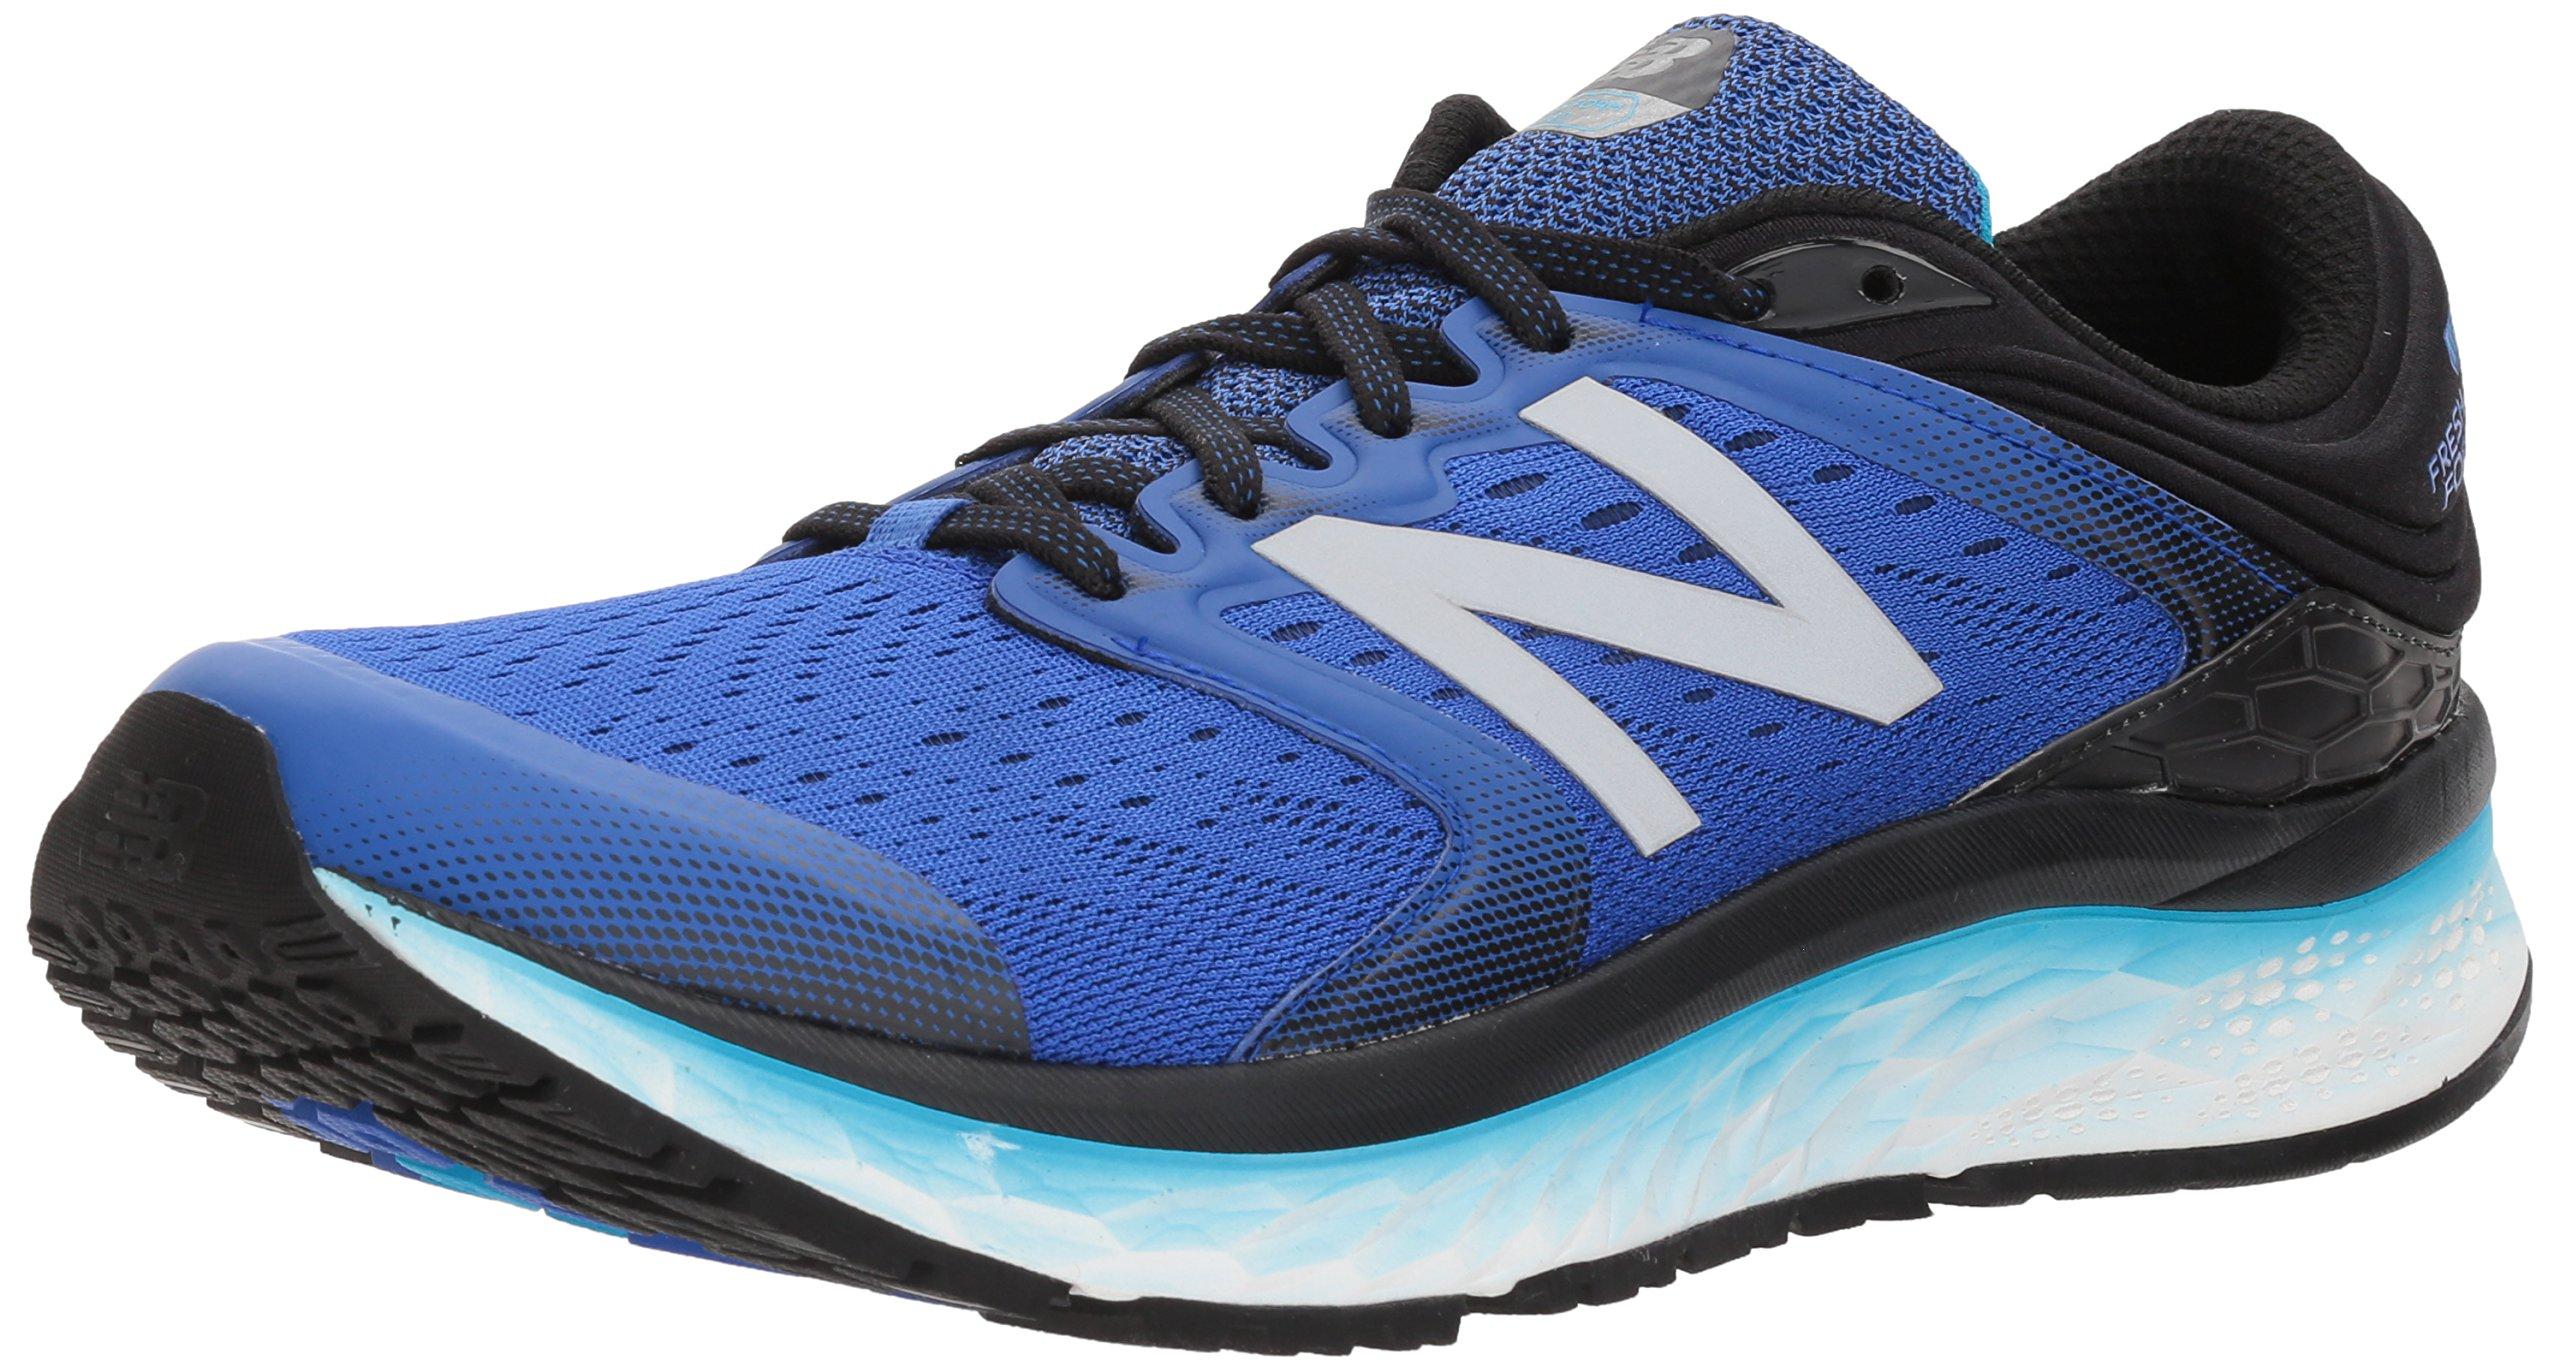 New Balance Men's 1080v8 Fresh Foam Running Shoe, Pacific/Black, 13 2E US by New Balance